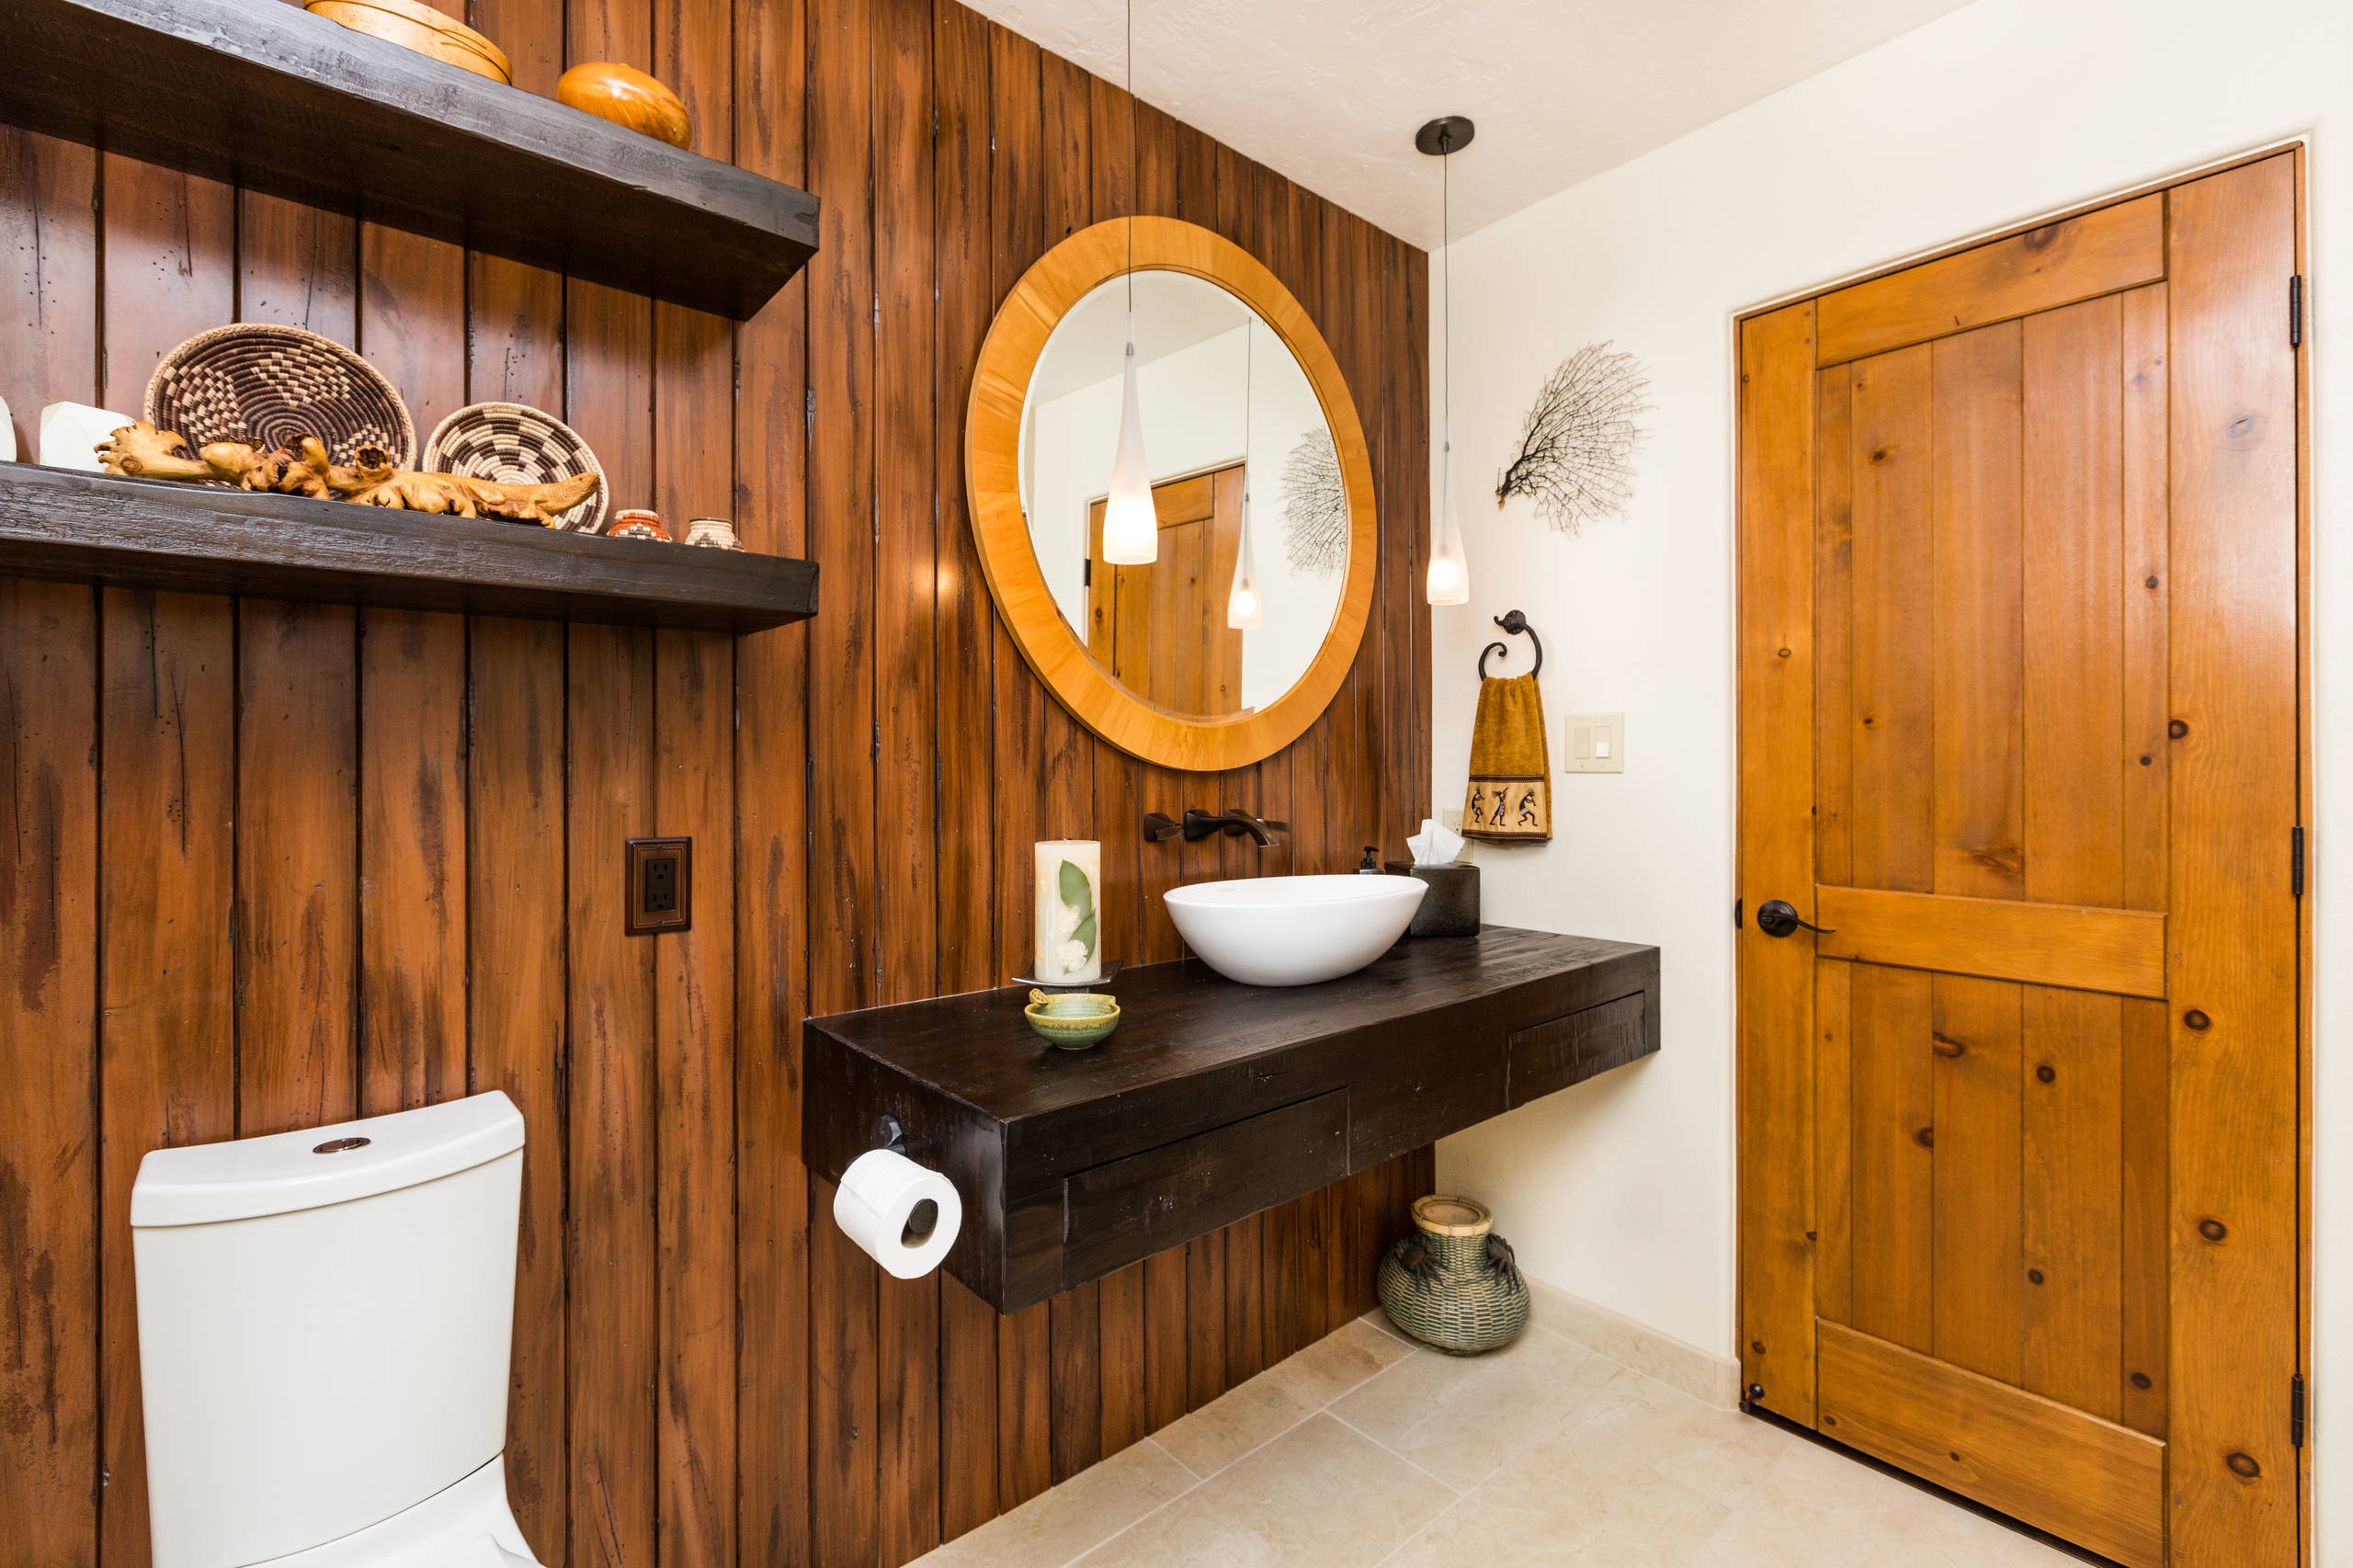 woodbath - DIY – Re-Staining Bathroom Cabinets